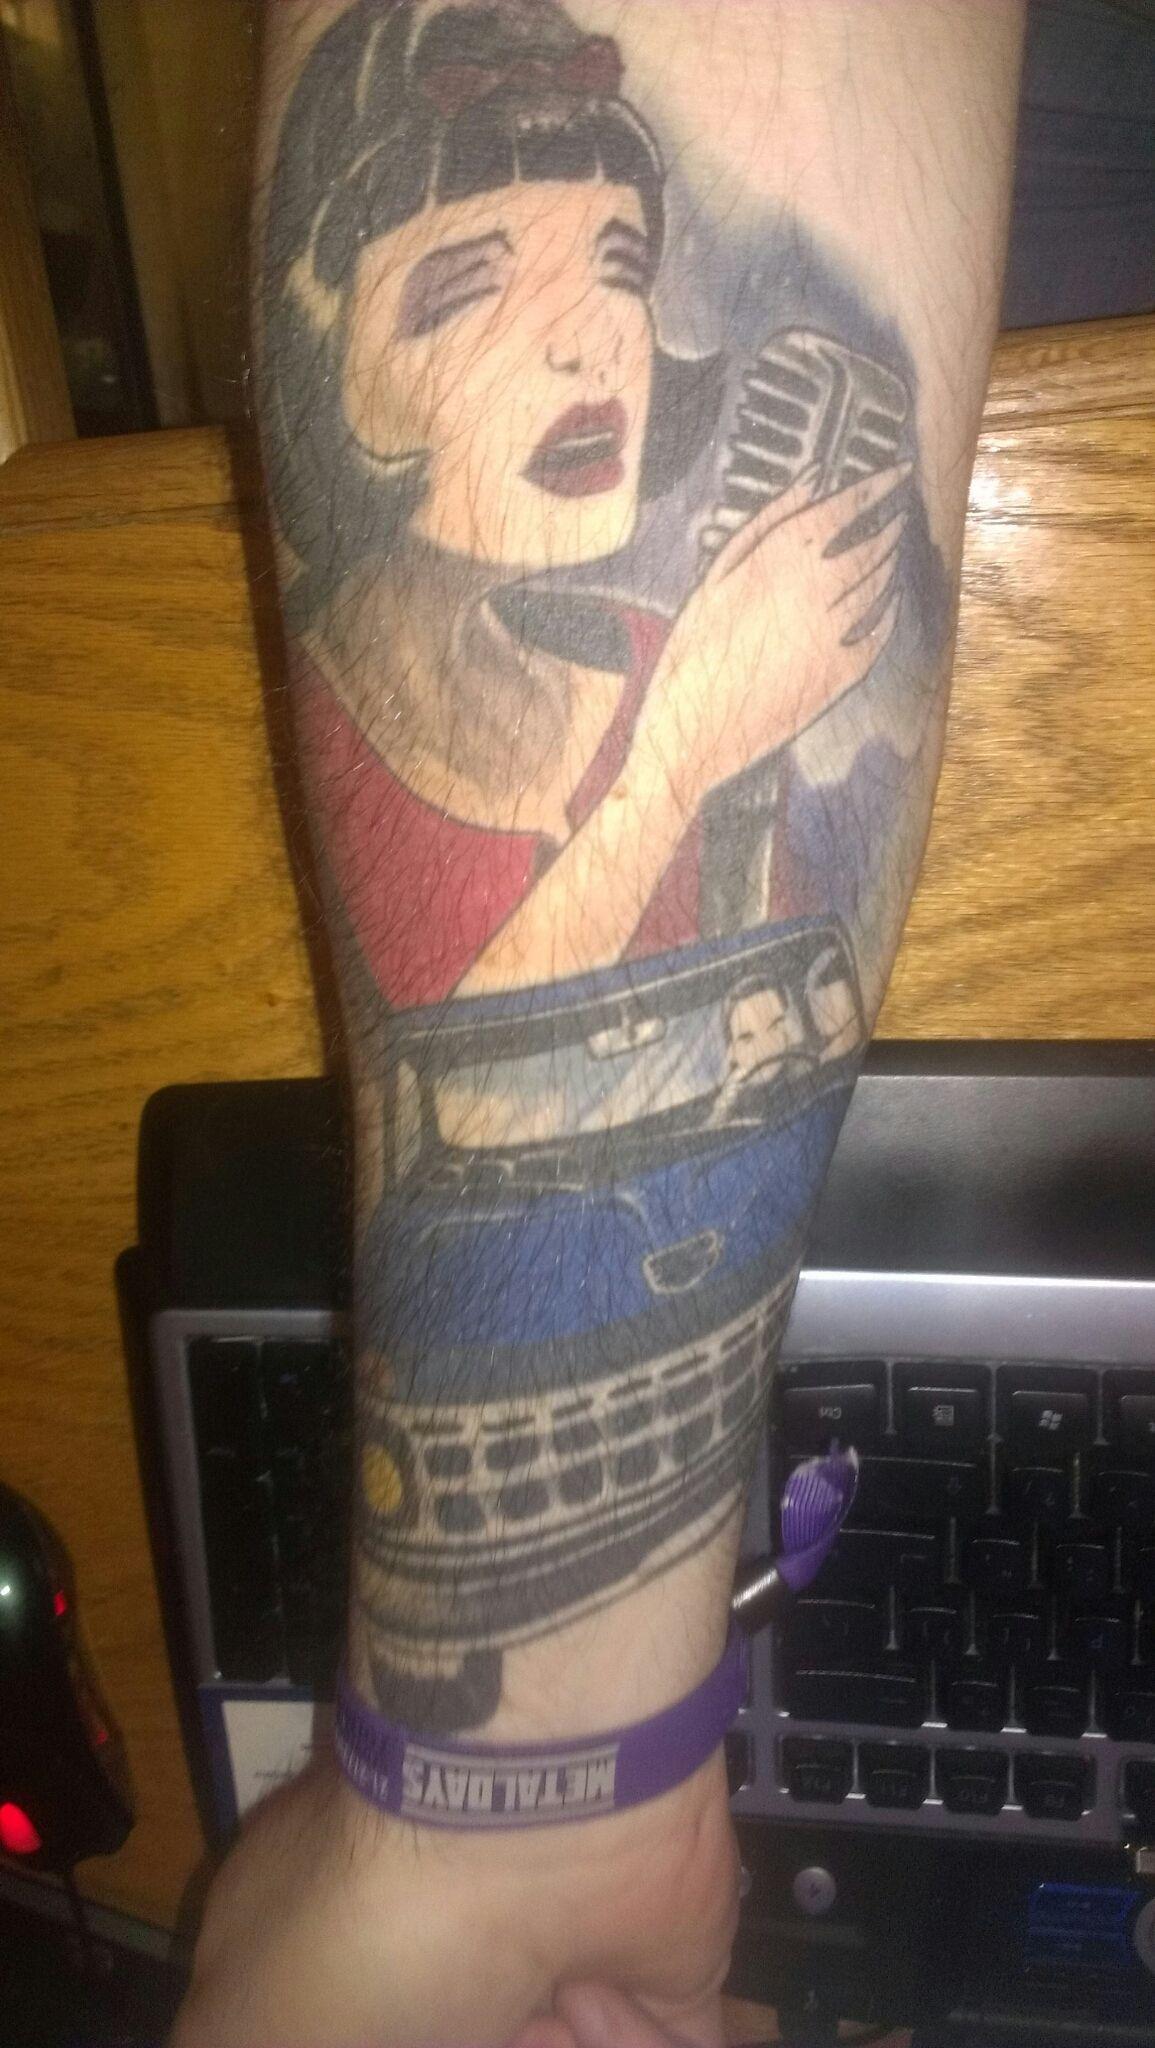 Pin by Miranda Simmons on Tattoos | Tattoos, Girl gifs, Get